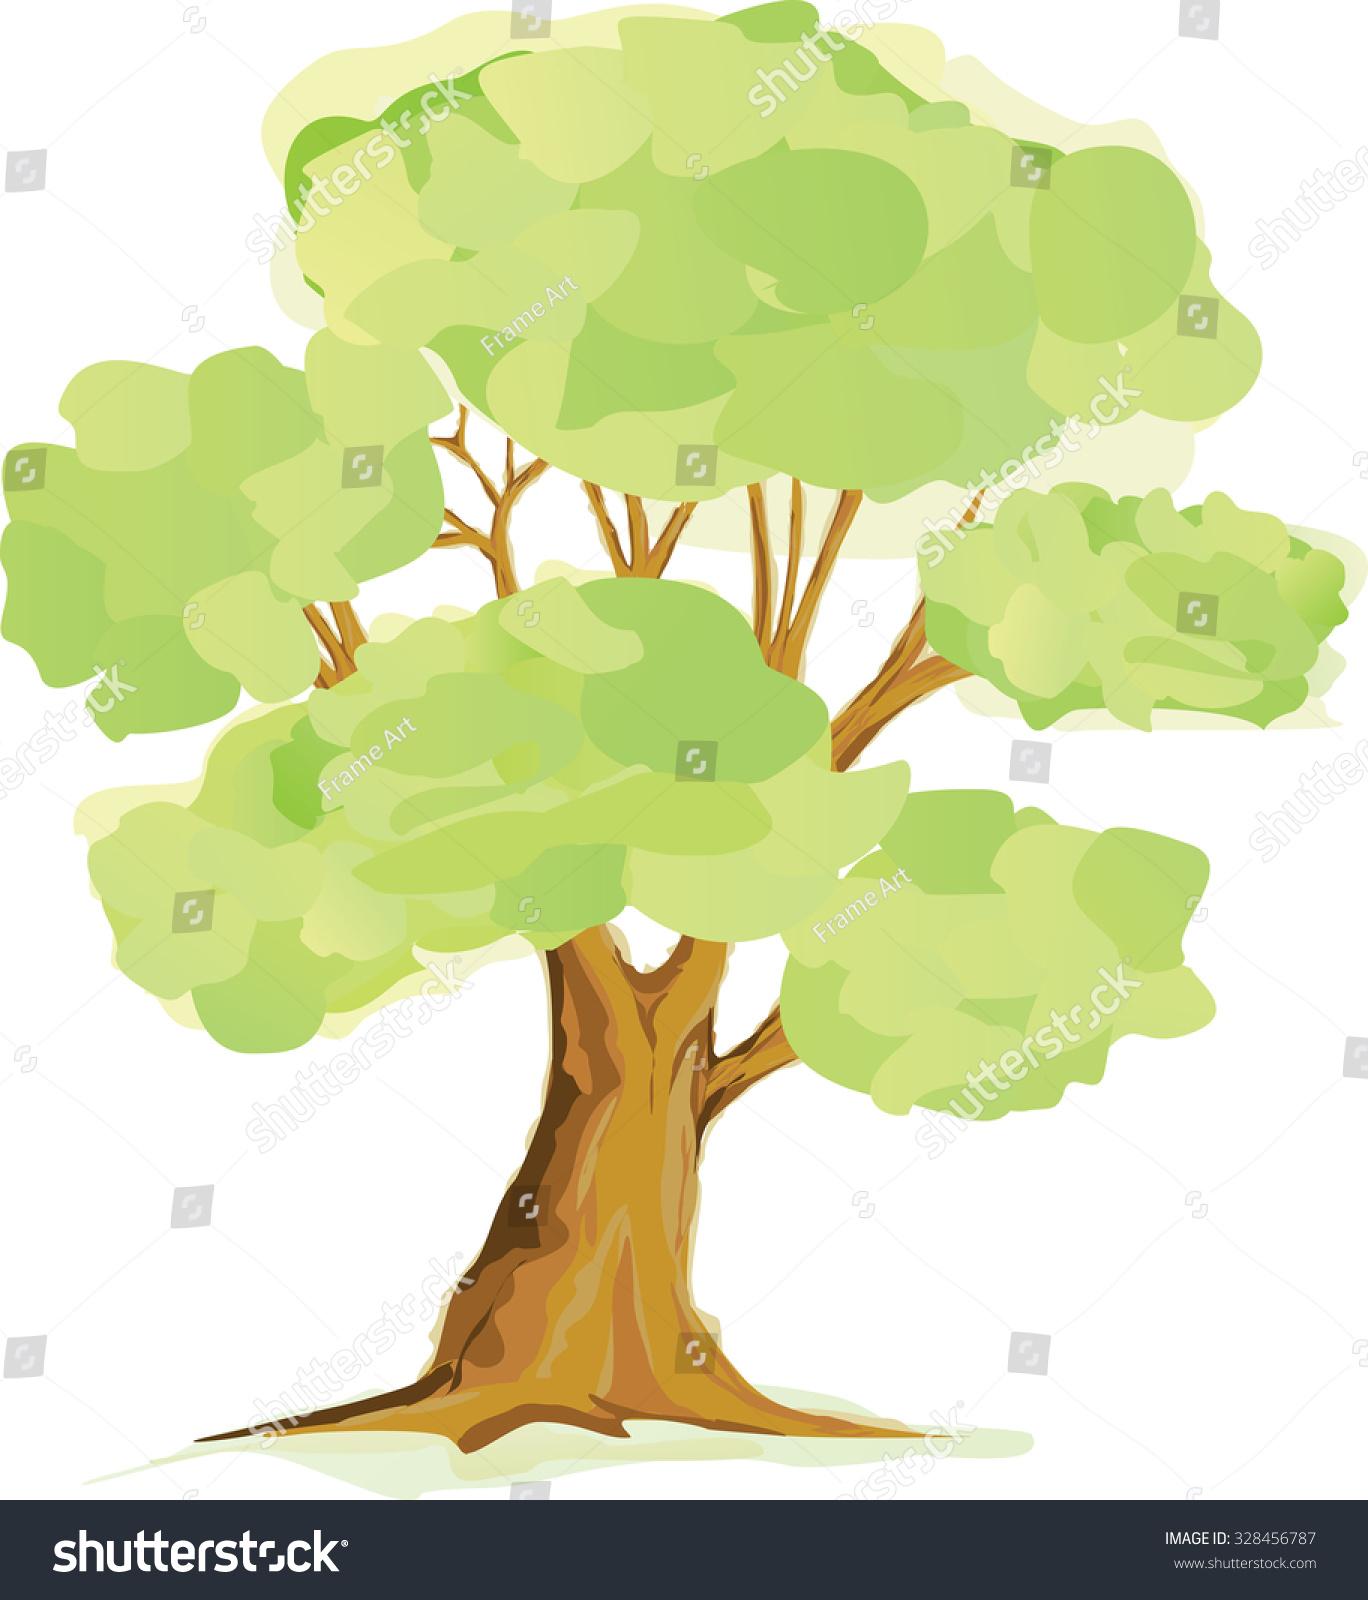 Tree Tree Paint Photo Drawing Art Stock Vector 328456787 - Shutterstock